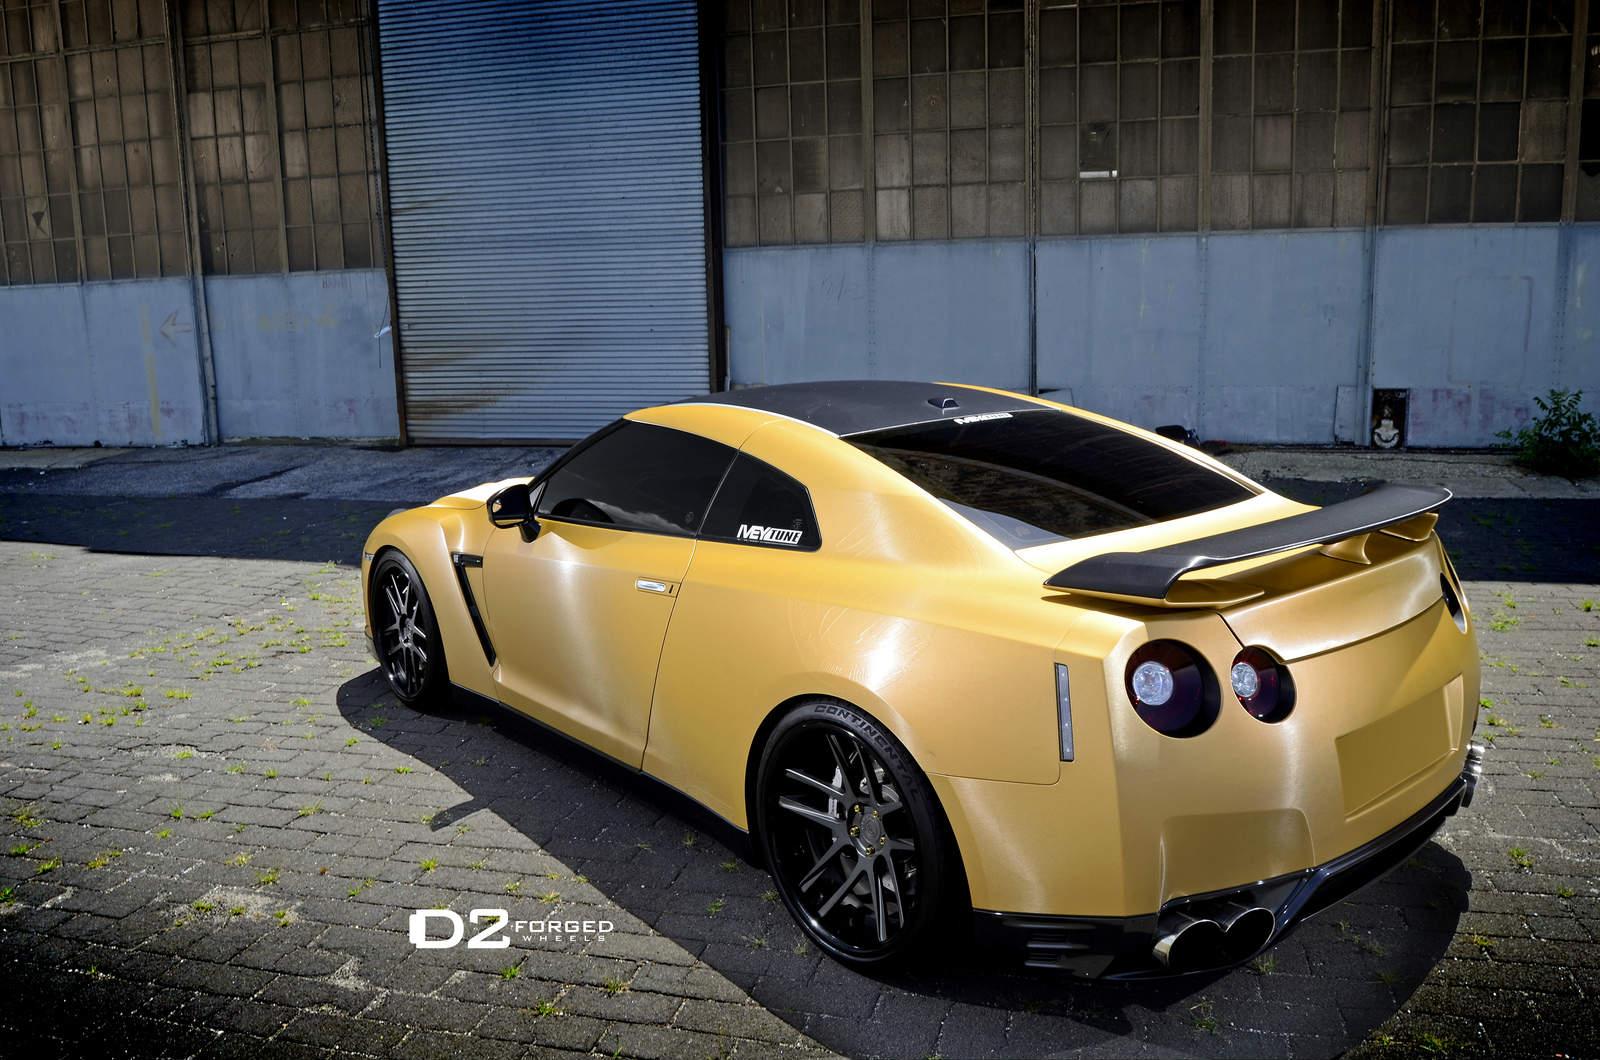 Benz Drift Car >> Matte Gold Nissan-GTR-D2FORGED-CV8-Wheels-three quarter rear left side close view - NO Car NO ...